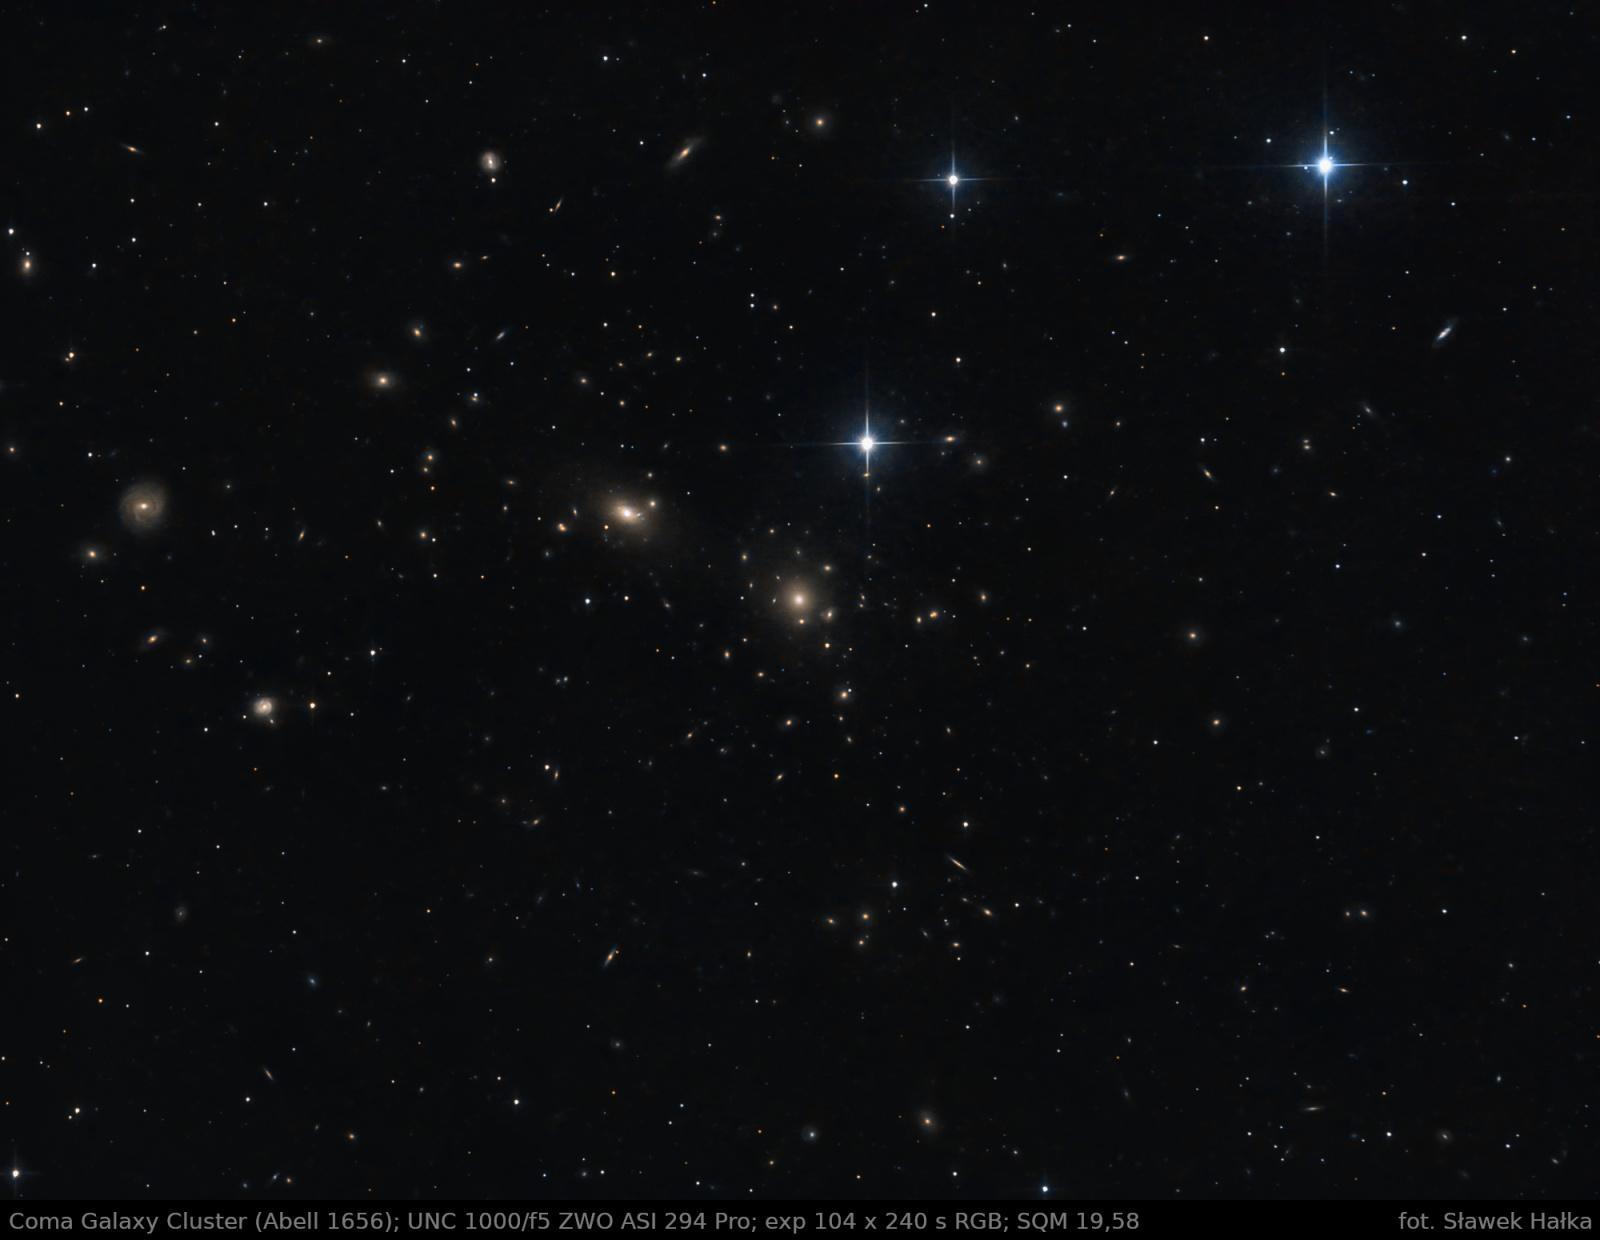 NGC4784_crop_3600_2700_final_resize_2000_1500.thumb.jpg.38ee8d8af5357c2ed0cfd863d80b1892.jpg